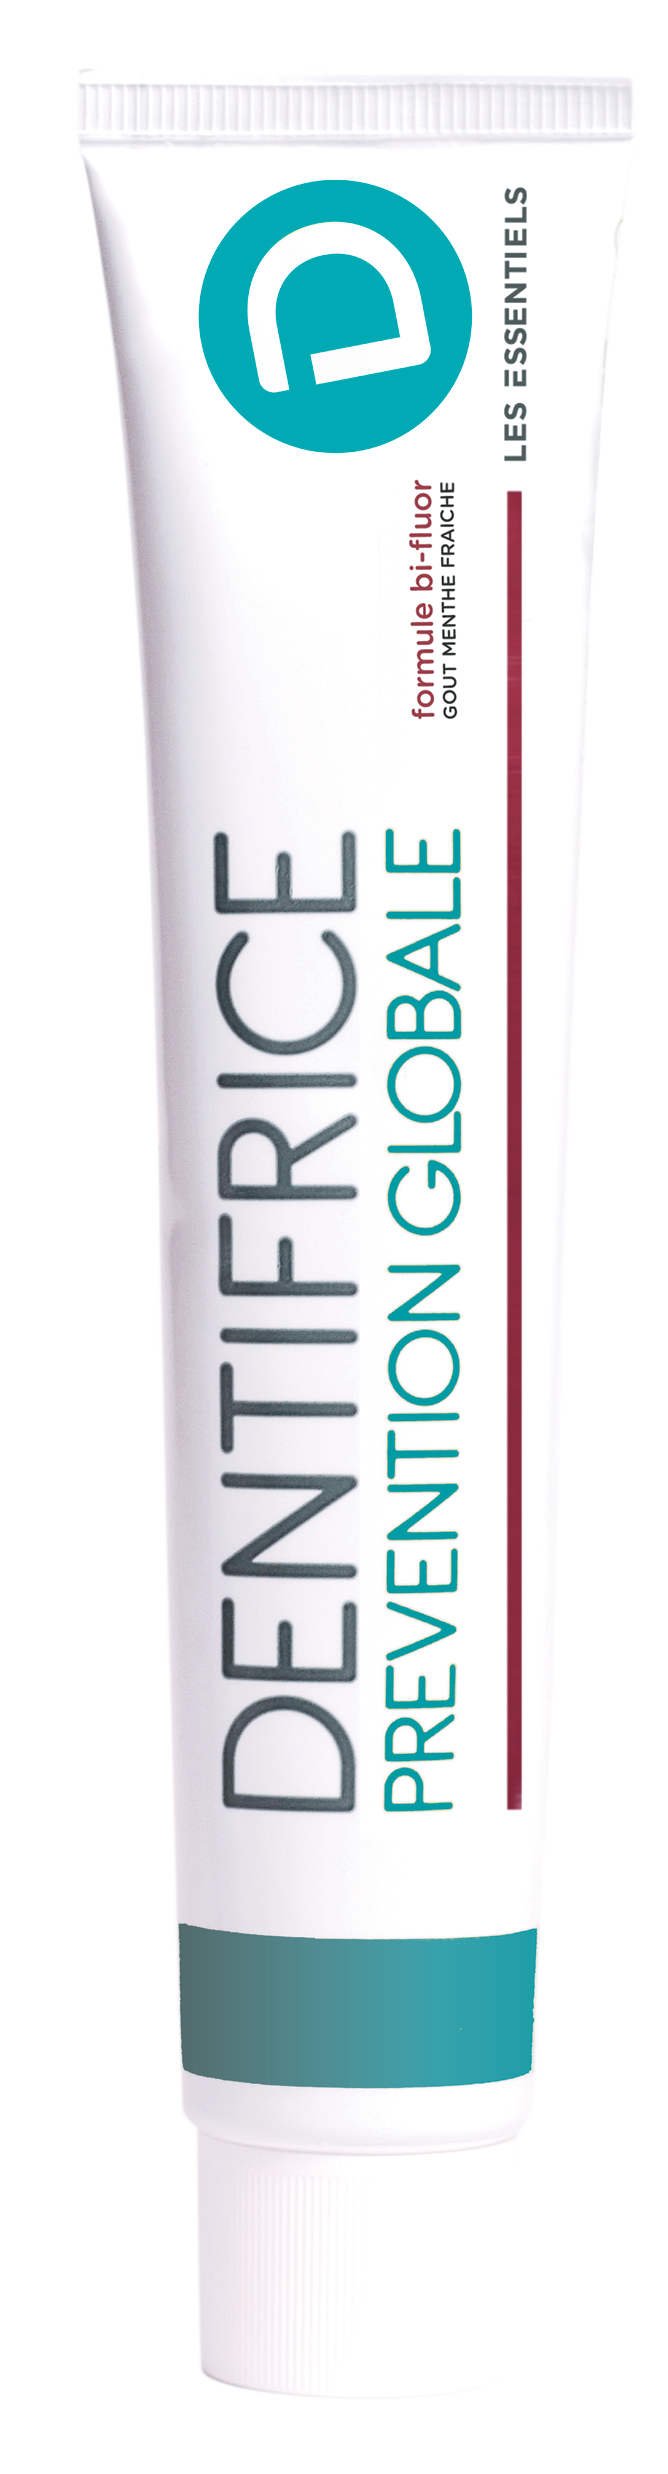 Dentifrice prevention globale D Les Essentiels